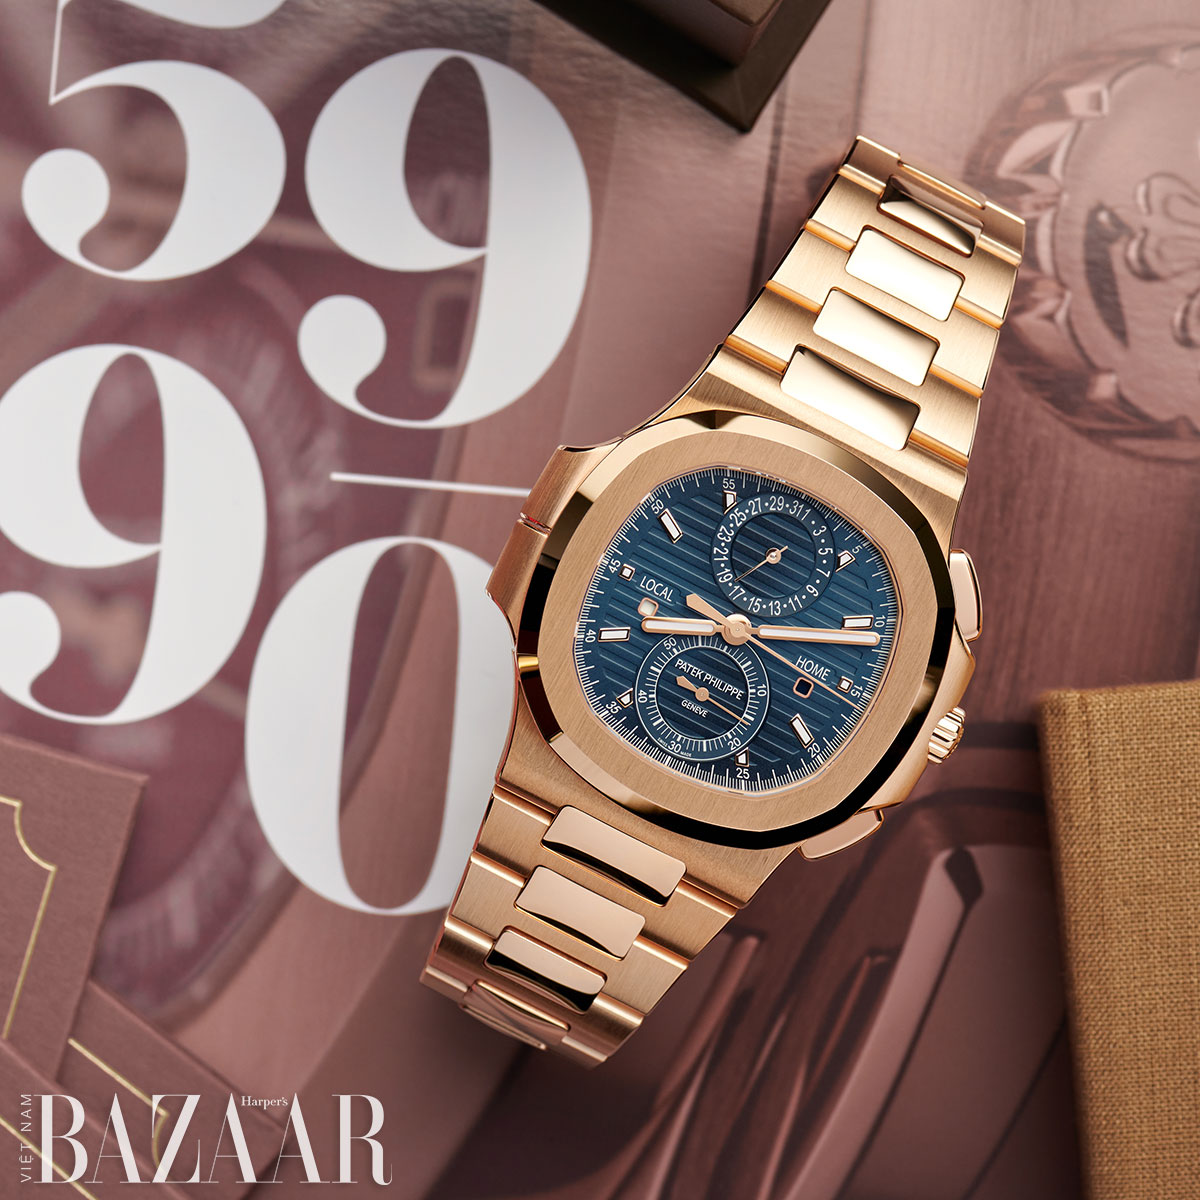 Patek Philippe ra mắt 4 mẫu đồng hồ Nautilus cho 2021 7